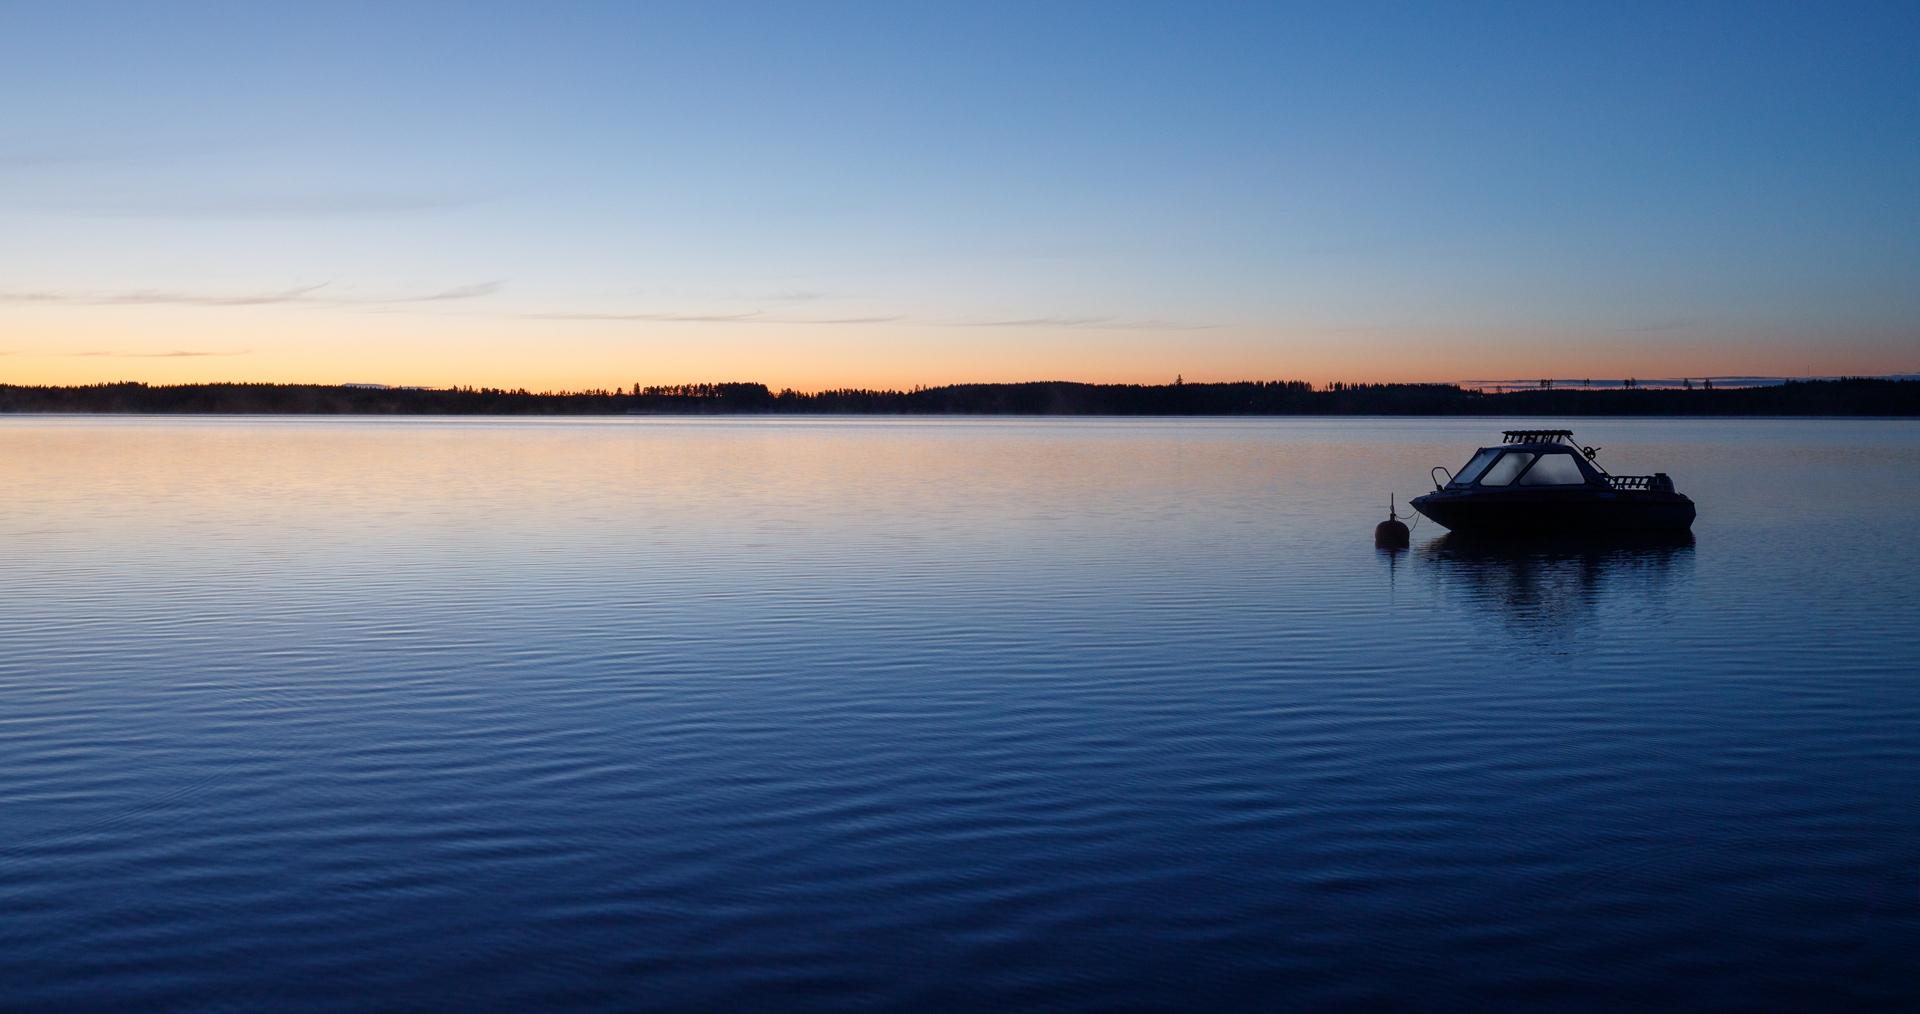 Blue hour - photography, landscape - anttitassberg | ello